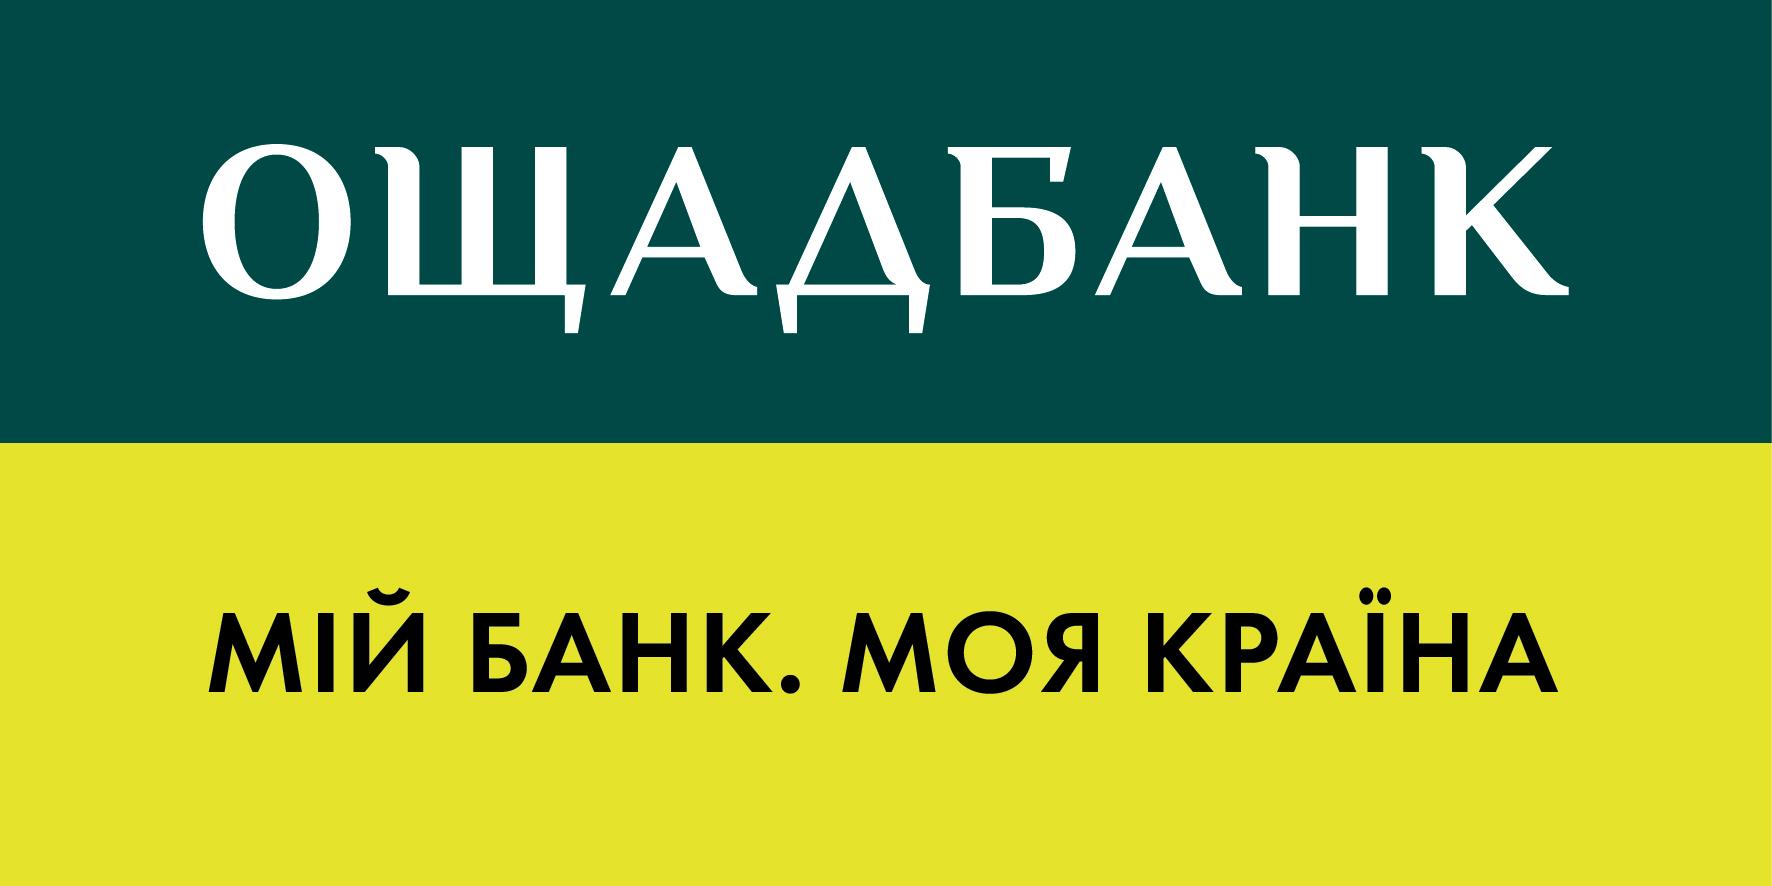 Курс валют в Ощадбанке logo